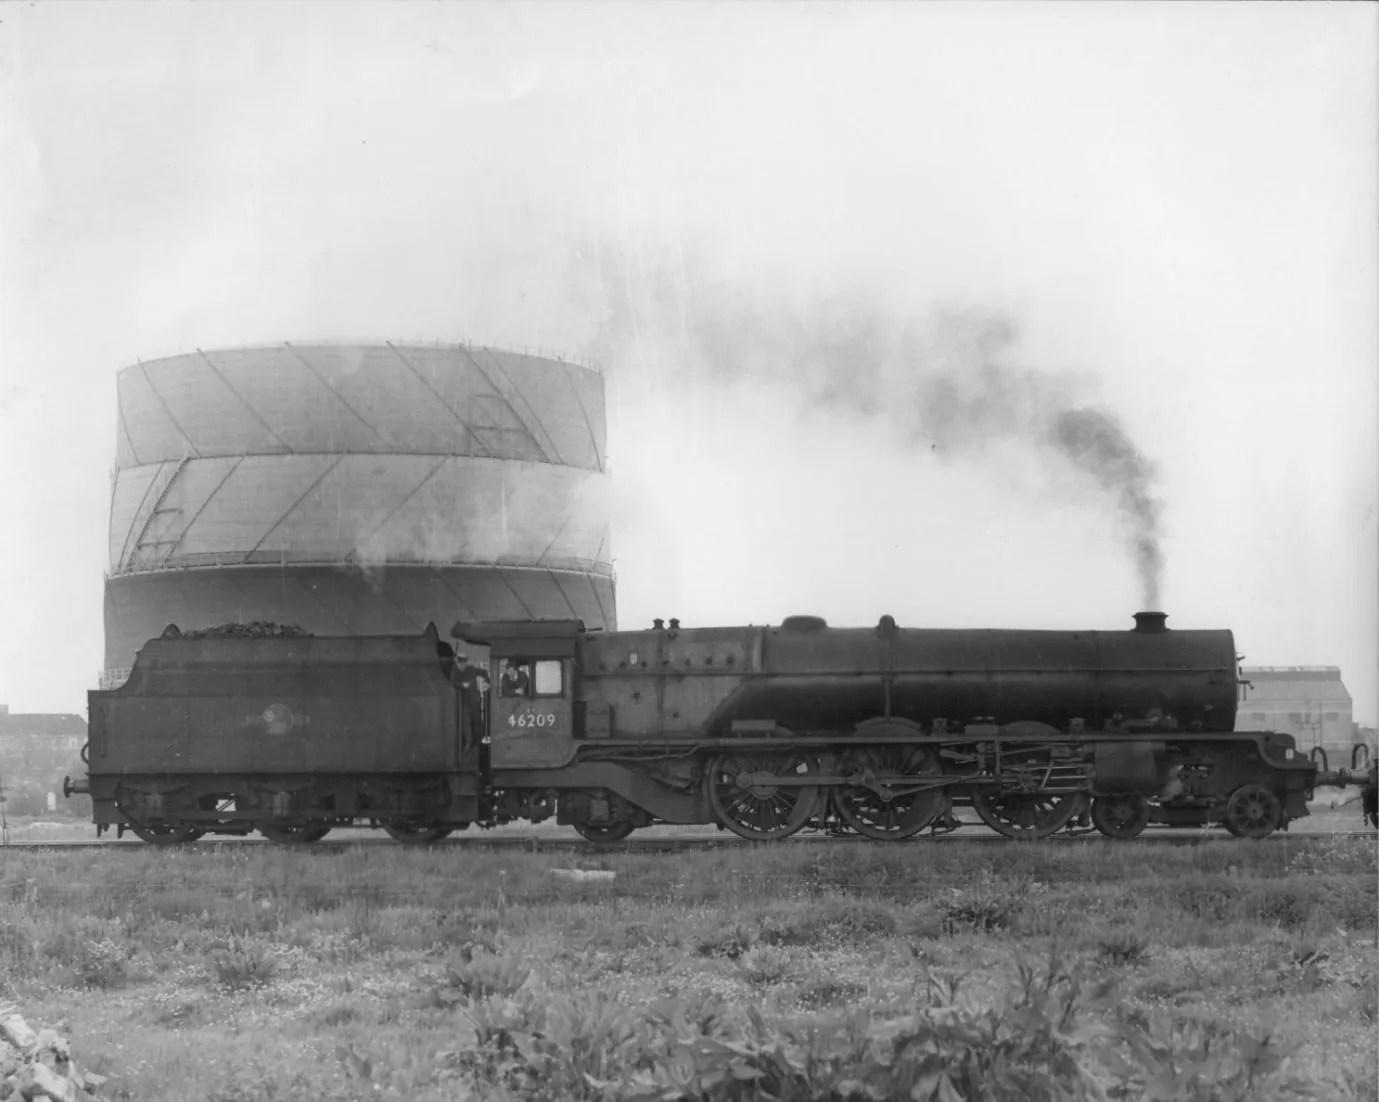 steam locomotive Princess Royal 46209 at Wigan - childhood railway memories